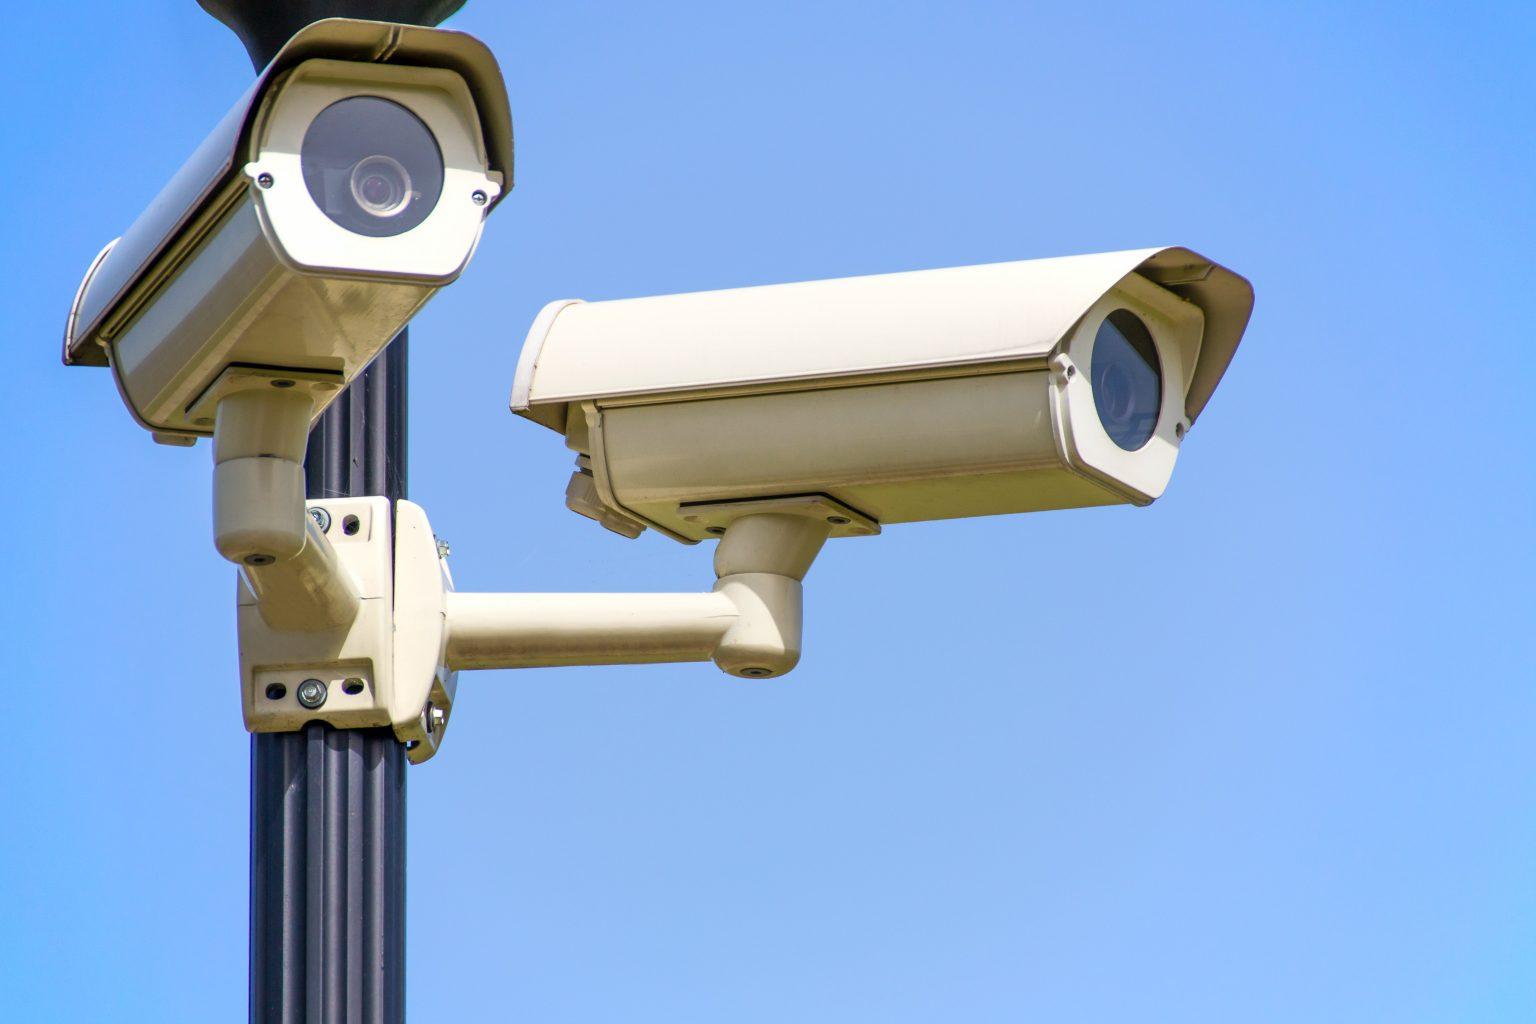 Pros & Cons Of Public Security Cameras